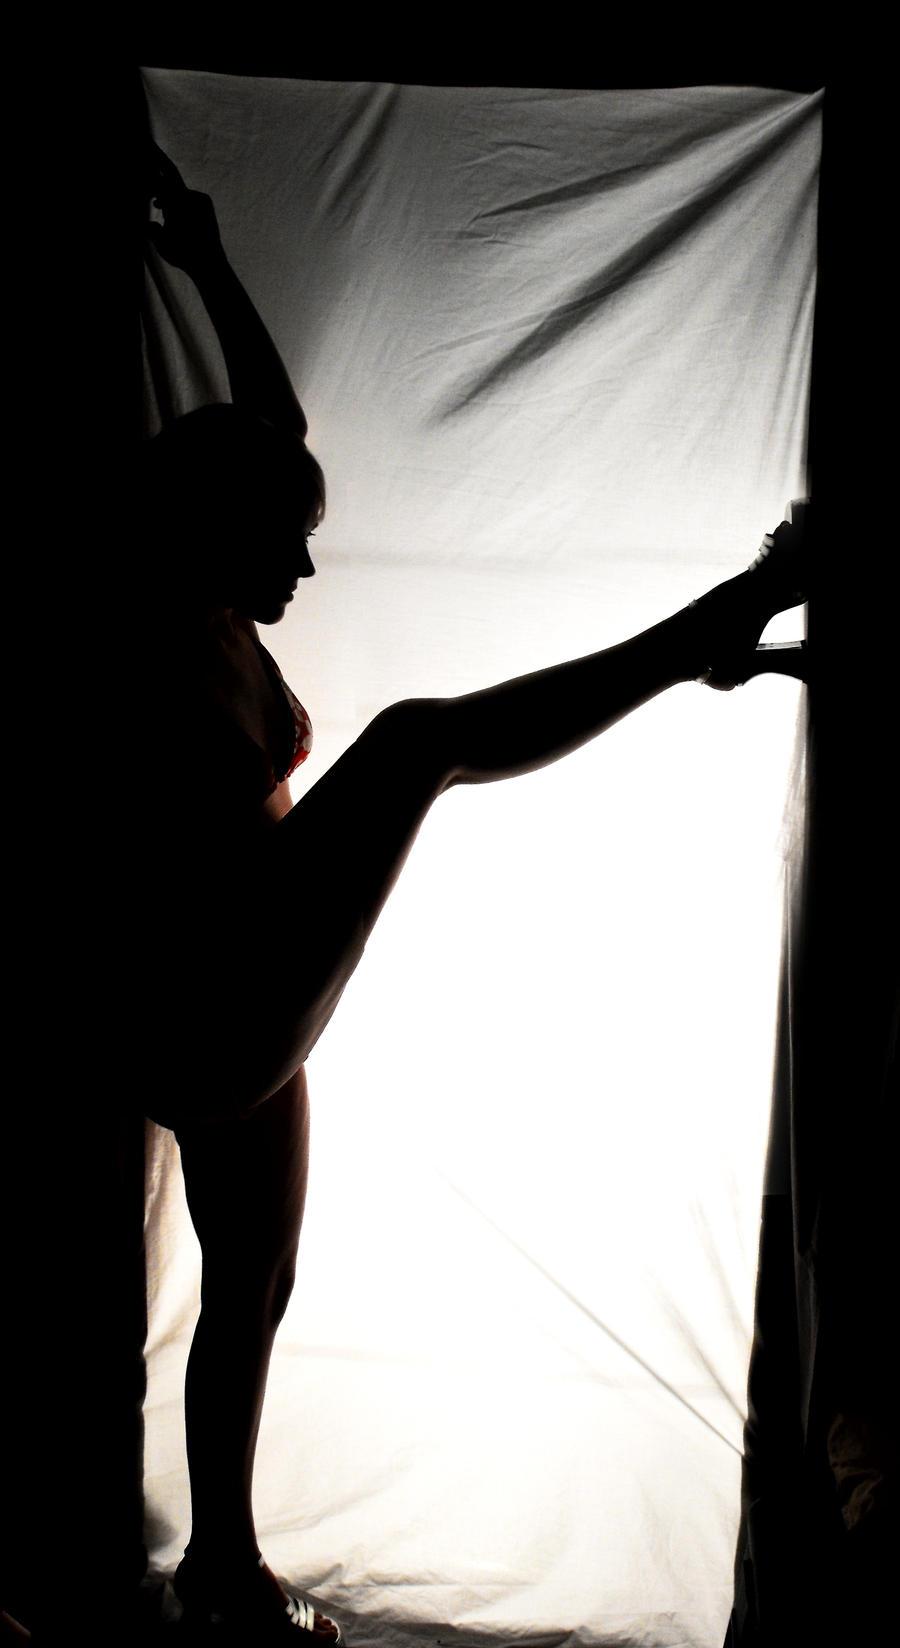 Silhouette by LadyRavenhawk